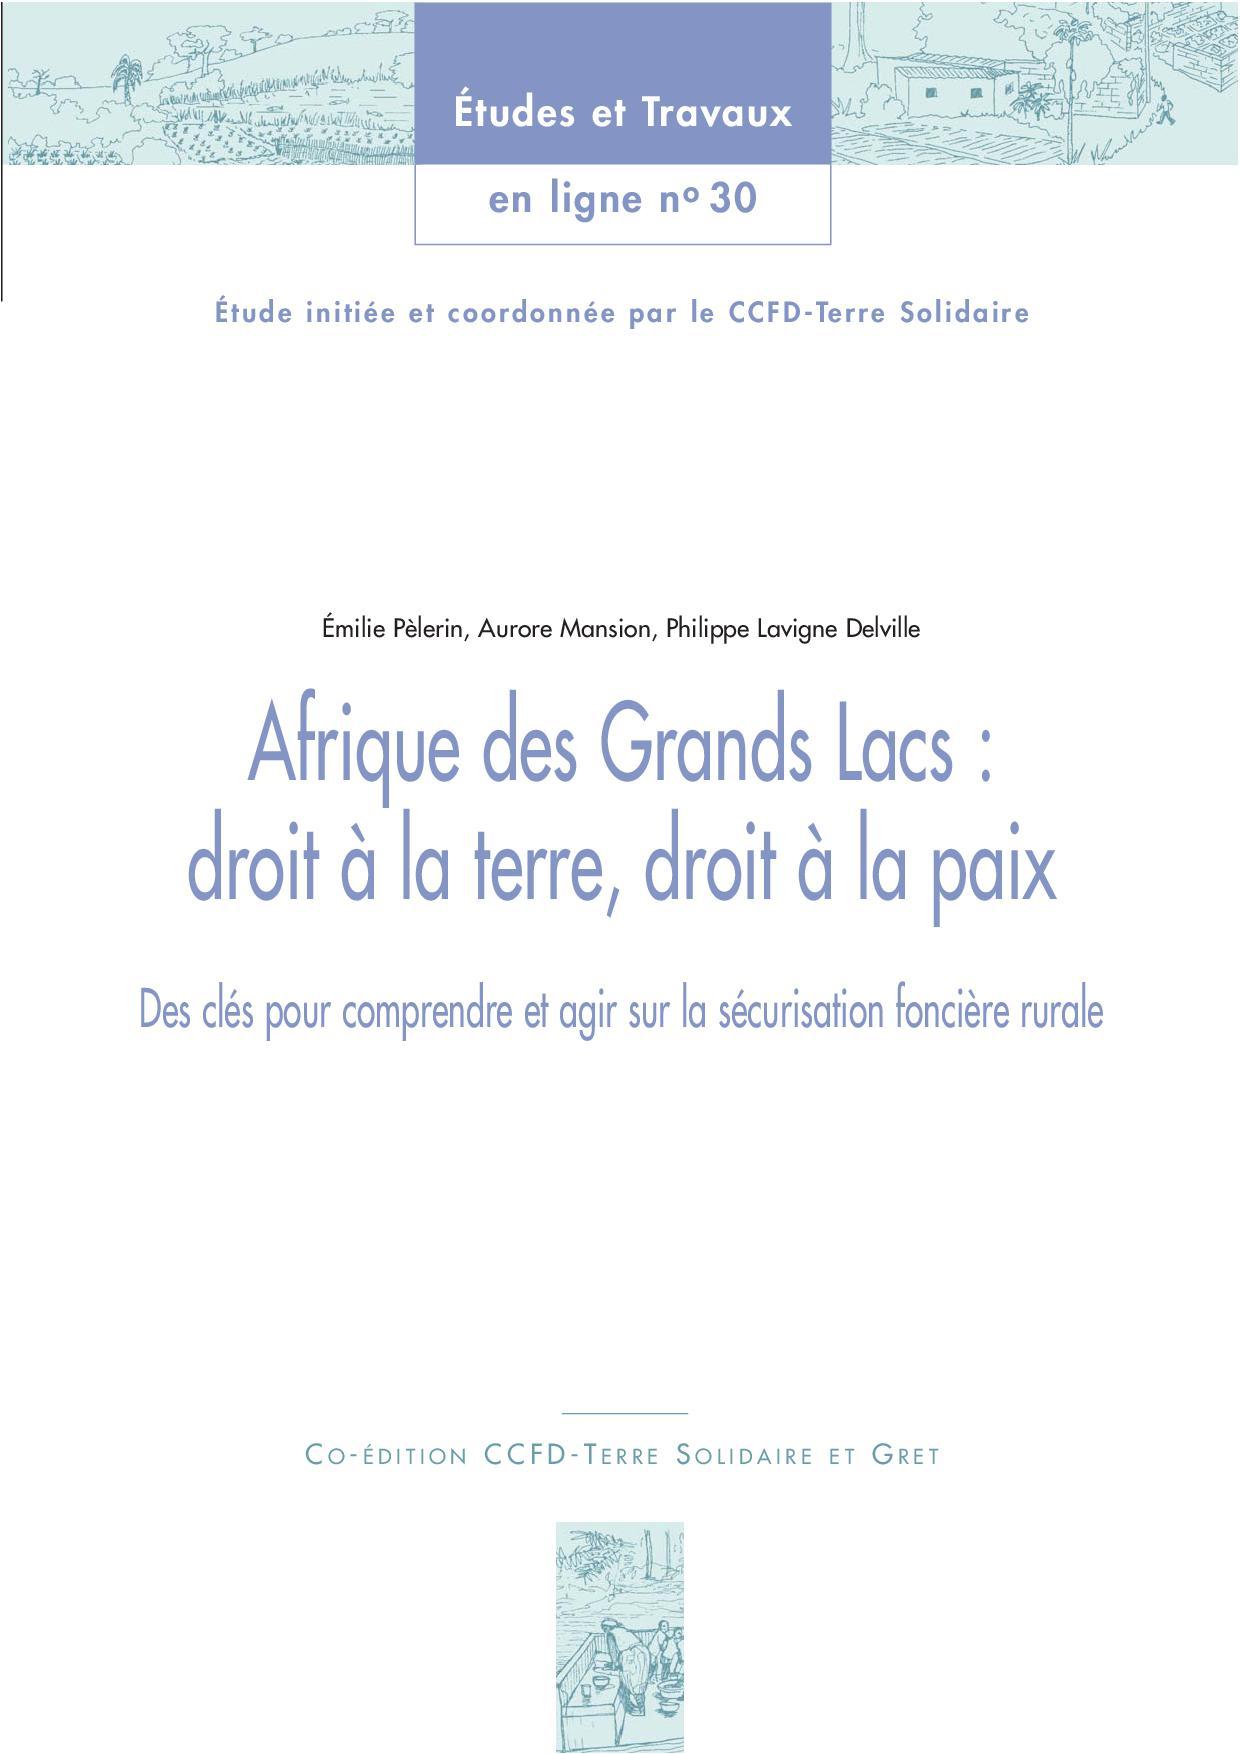 ETli30_gds lacs_CCFD